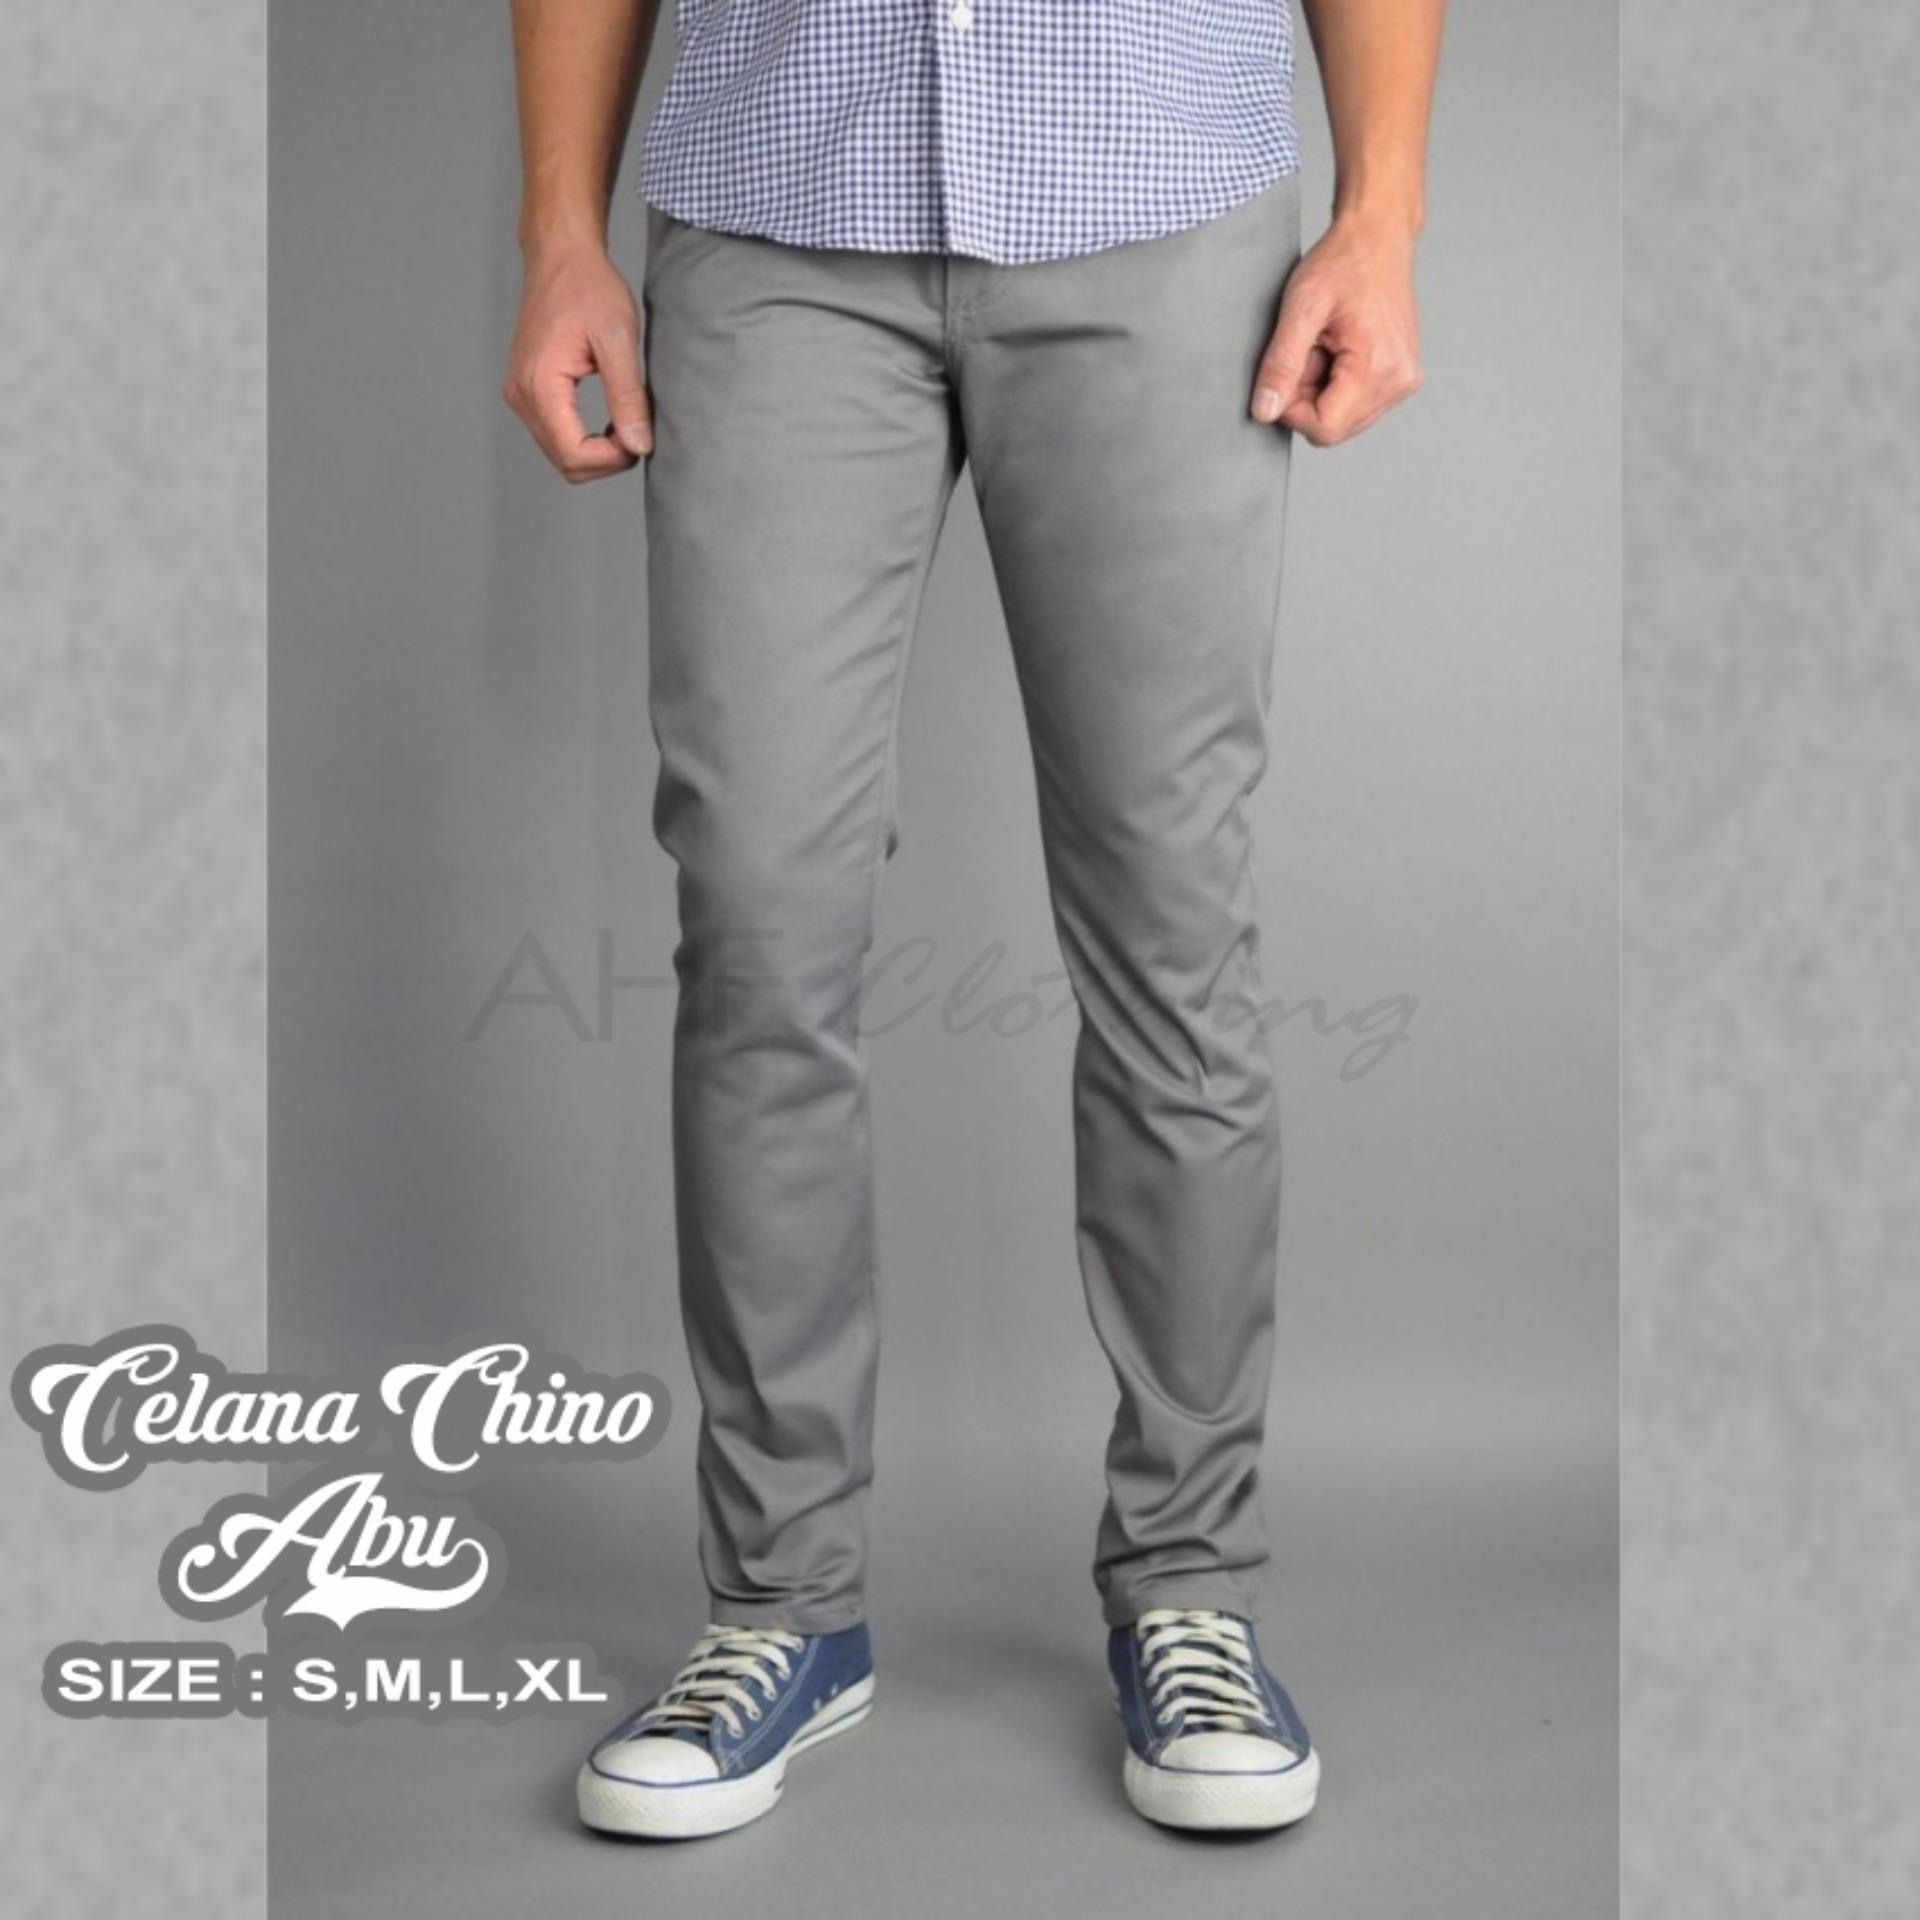 Cek Harga Baru Celana Panjang Jeans Cream Krem Khaki Royalvip Pria Formal Chino Wool Black Chinos Cowok Kremcream Hitam